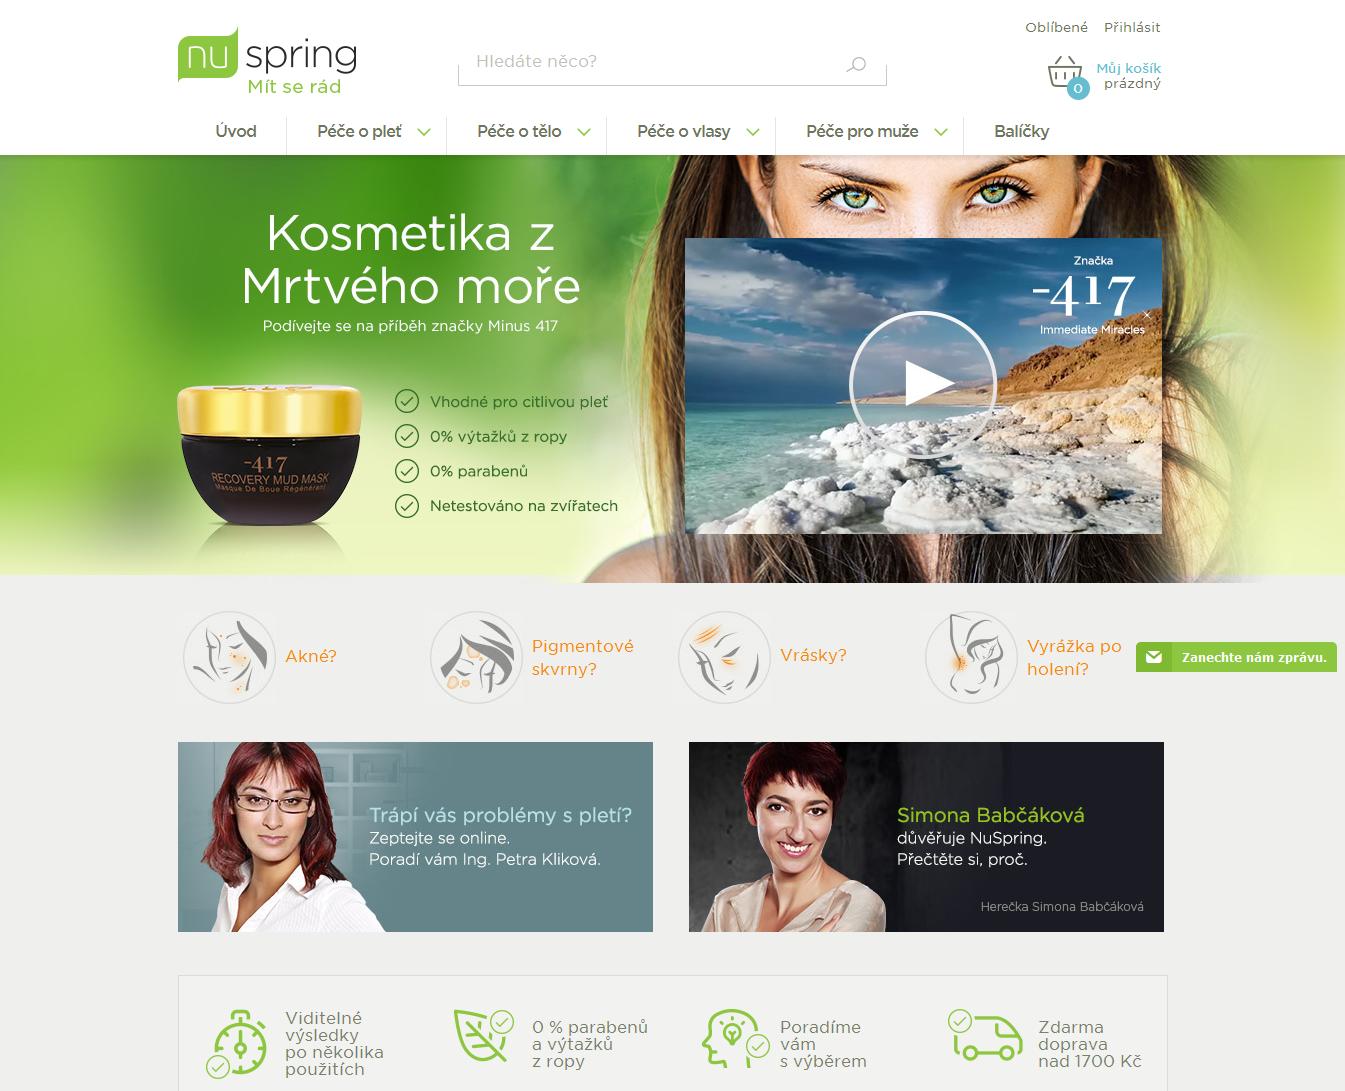 NuSpring.cz homepage kosmetika Mrtvého moře